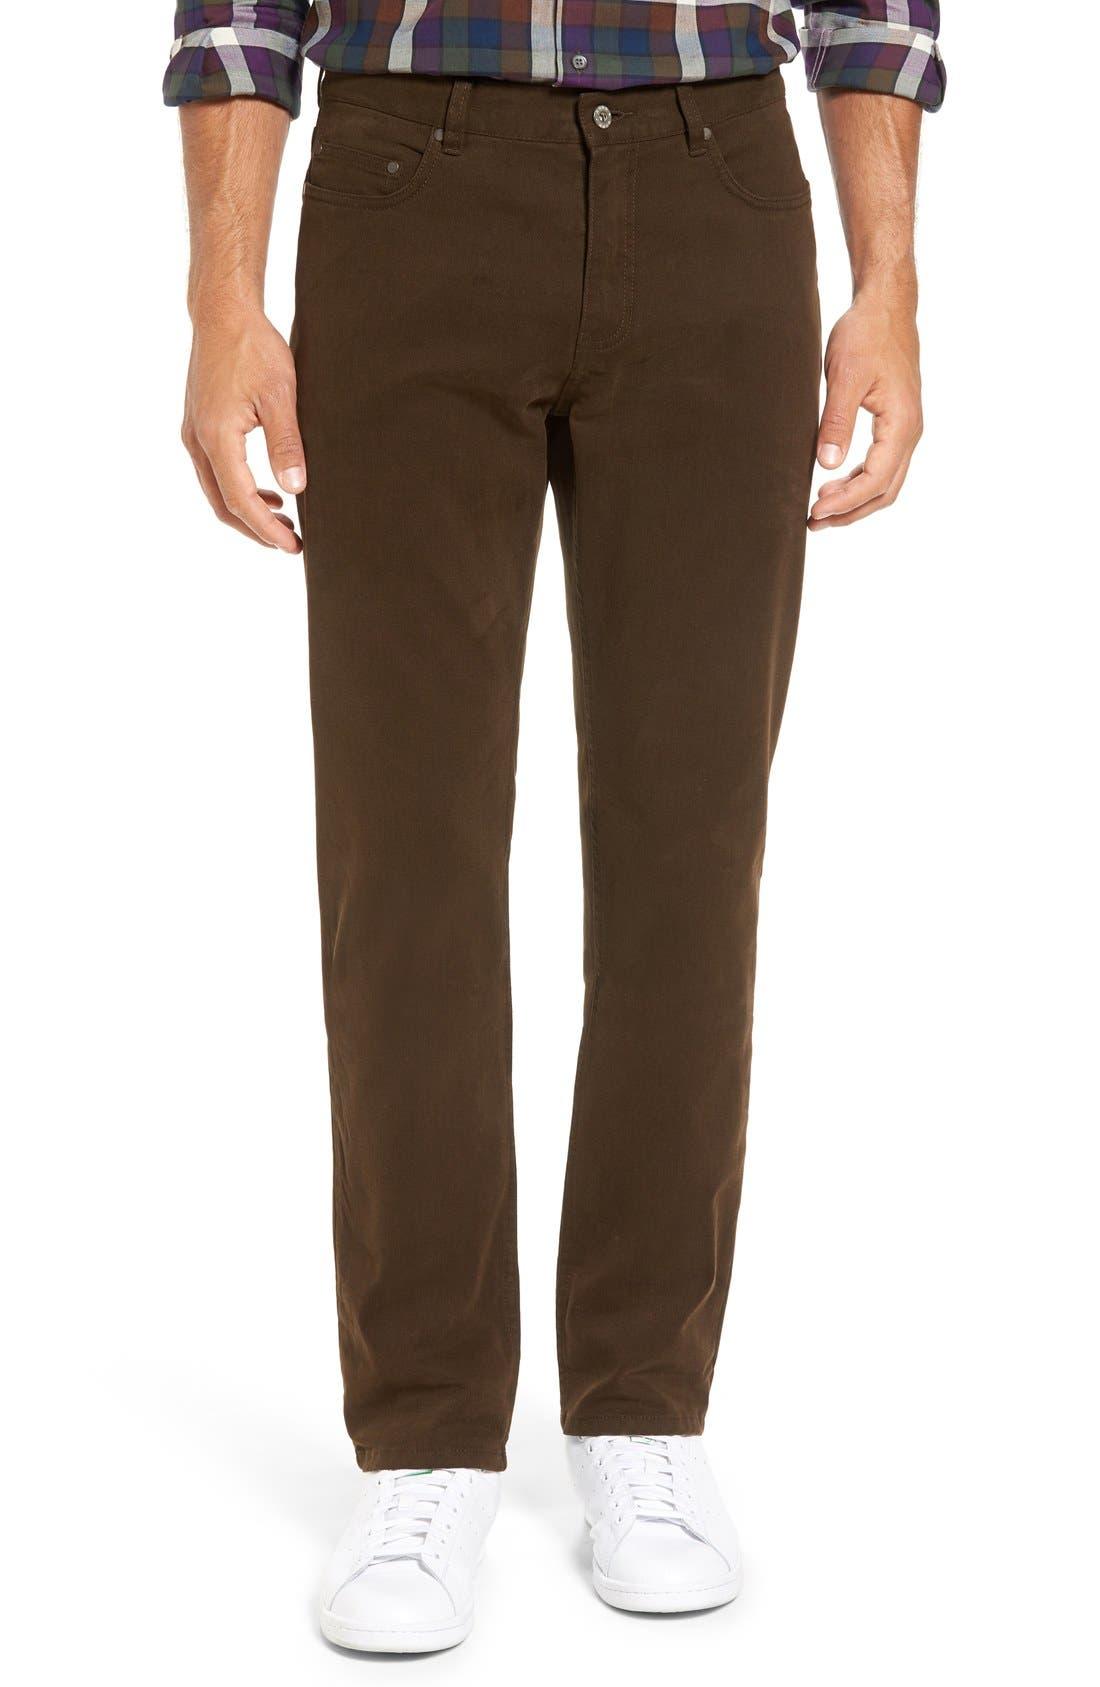 'Barters' Straight Leg Twill Pants,                         Main,                         color, Dark Tobacco